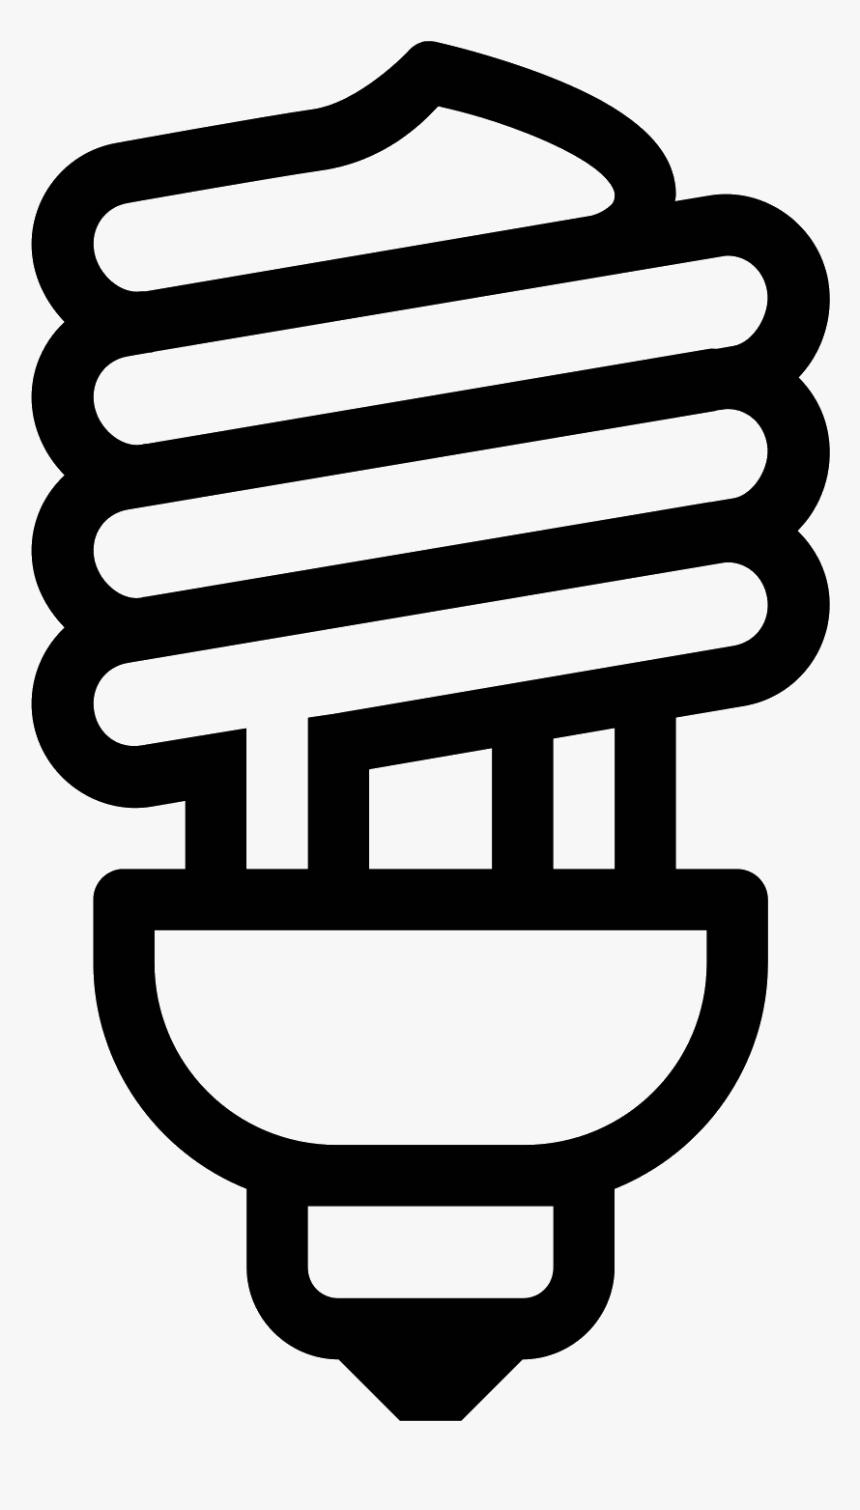 spiral bulb icon logo lampu spiral hd png download kindpng spiral bulb icon logo lampu spiral